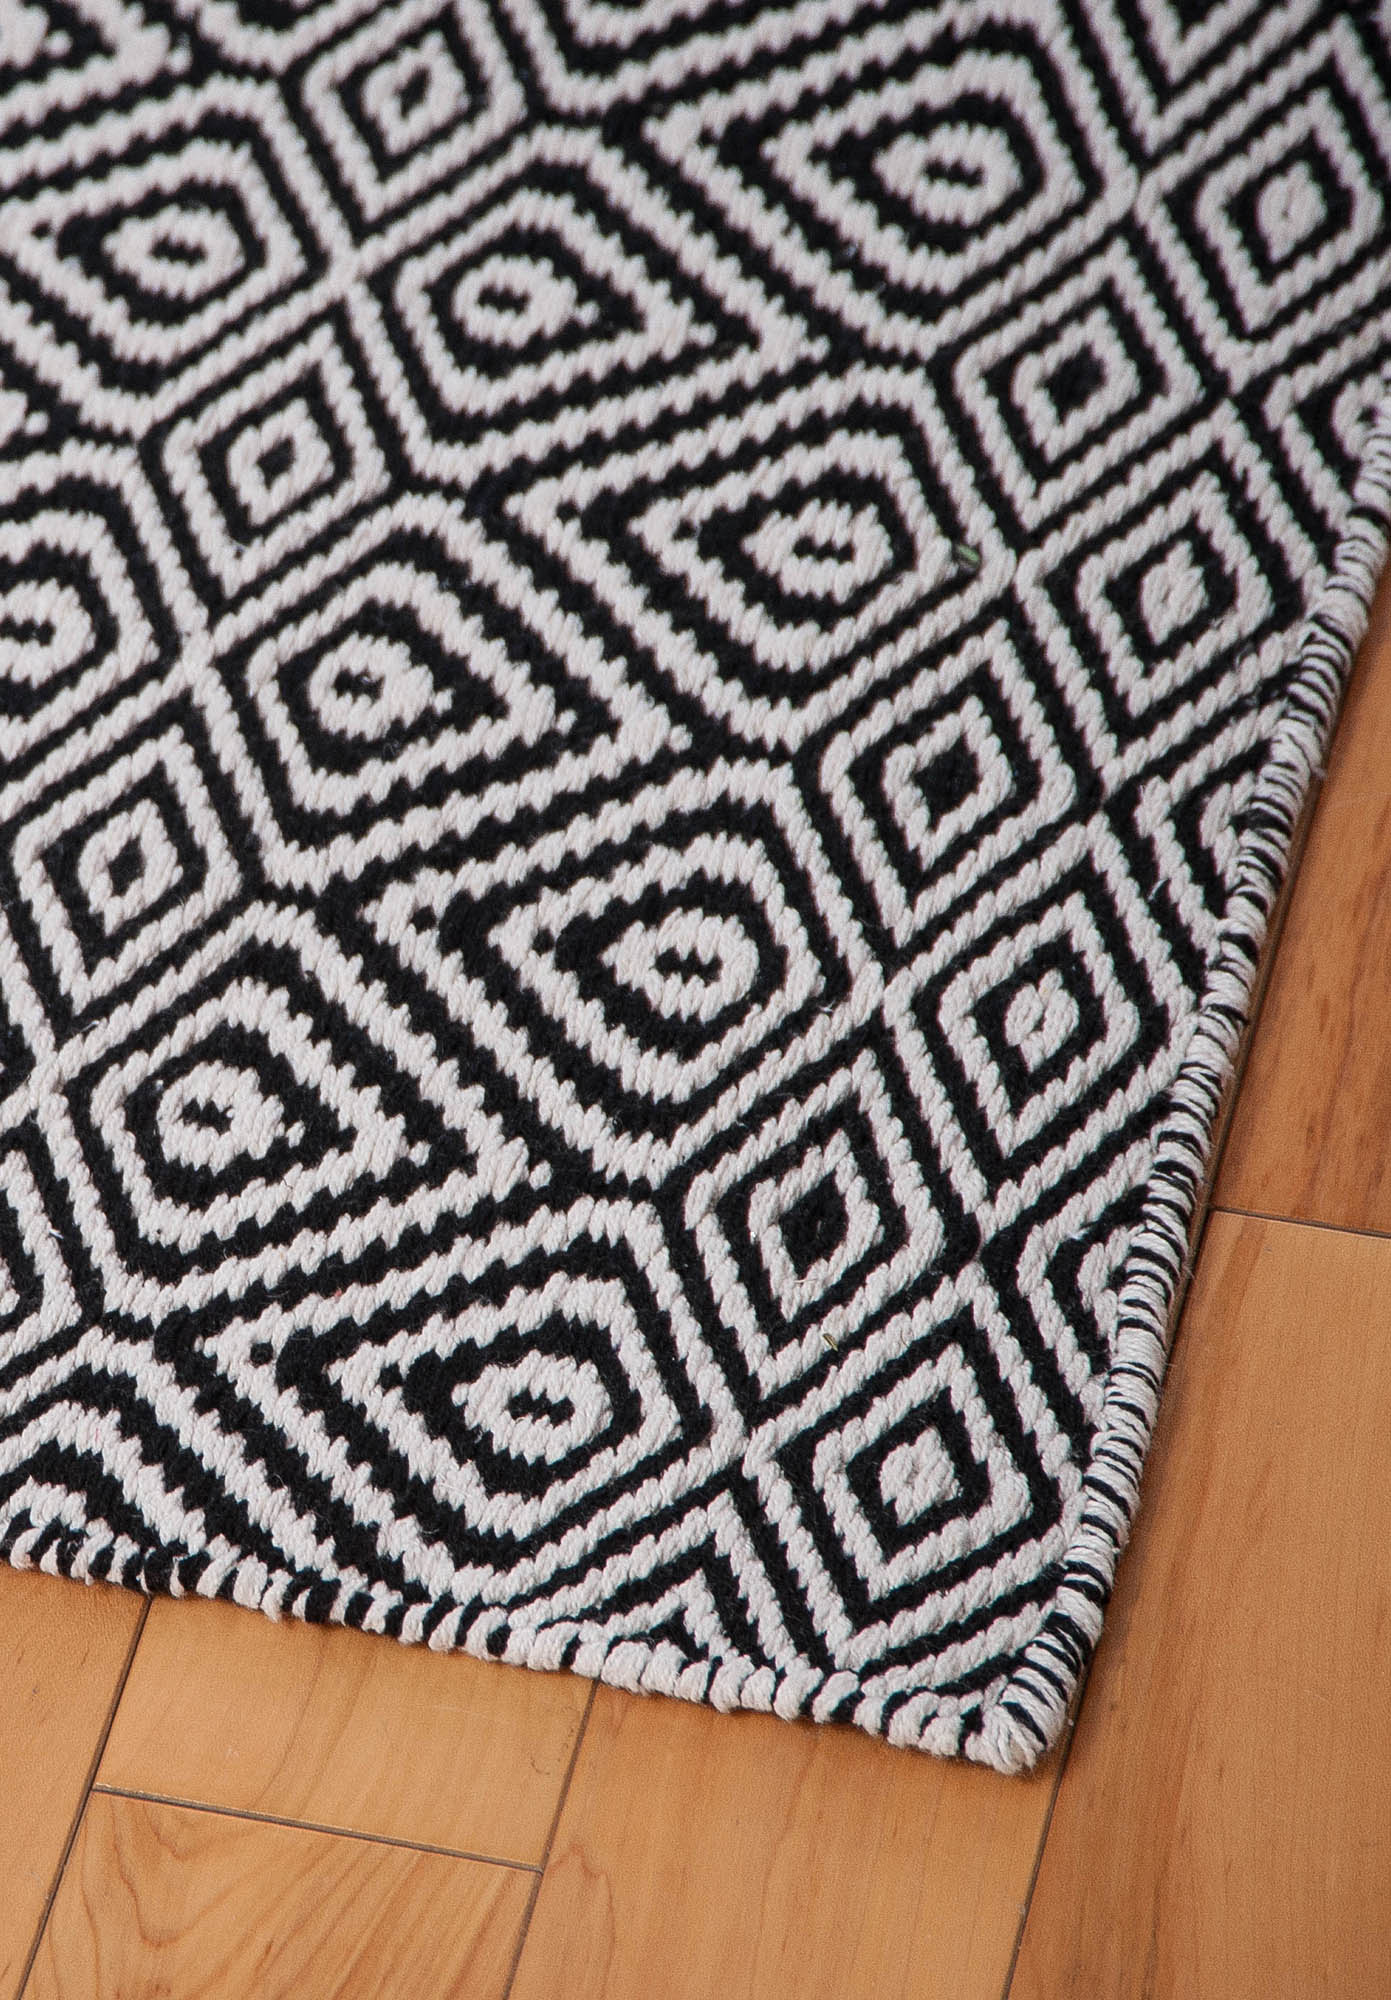 Wild Diamonds Eco Cotton Rug - Black/White - Hook & Loom